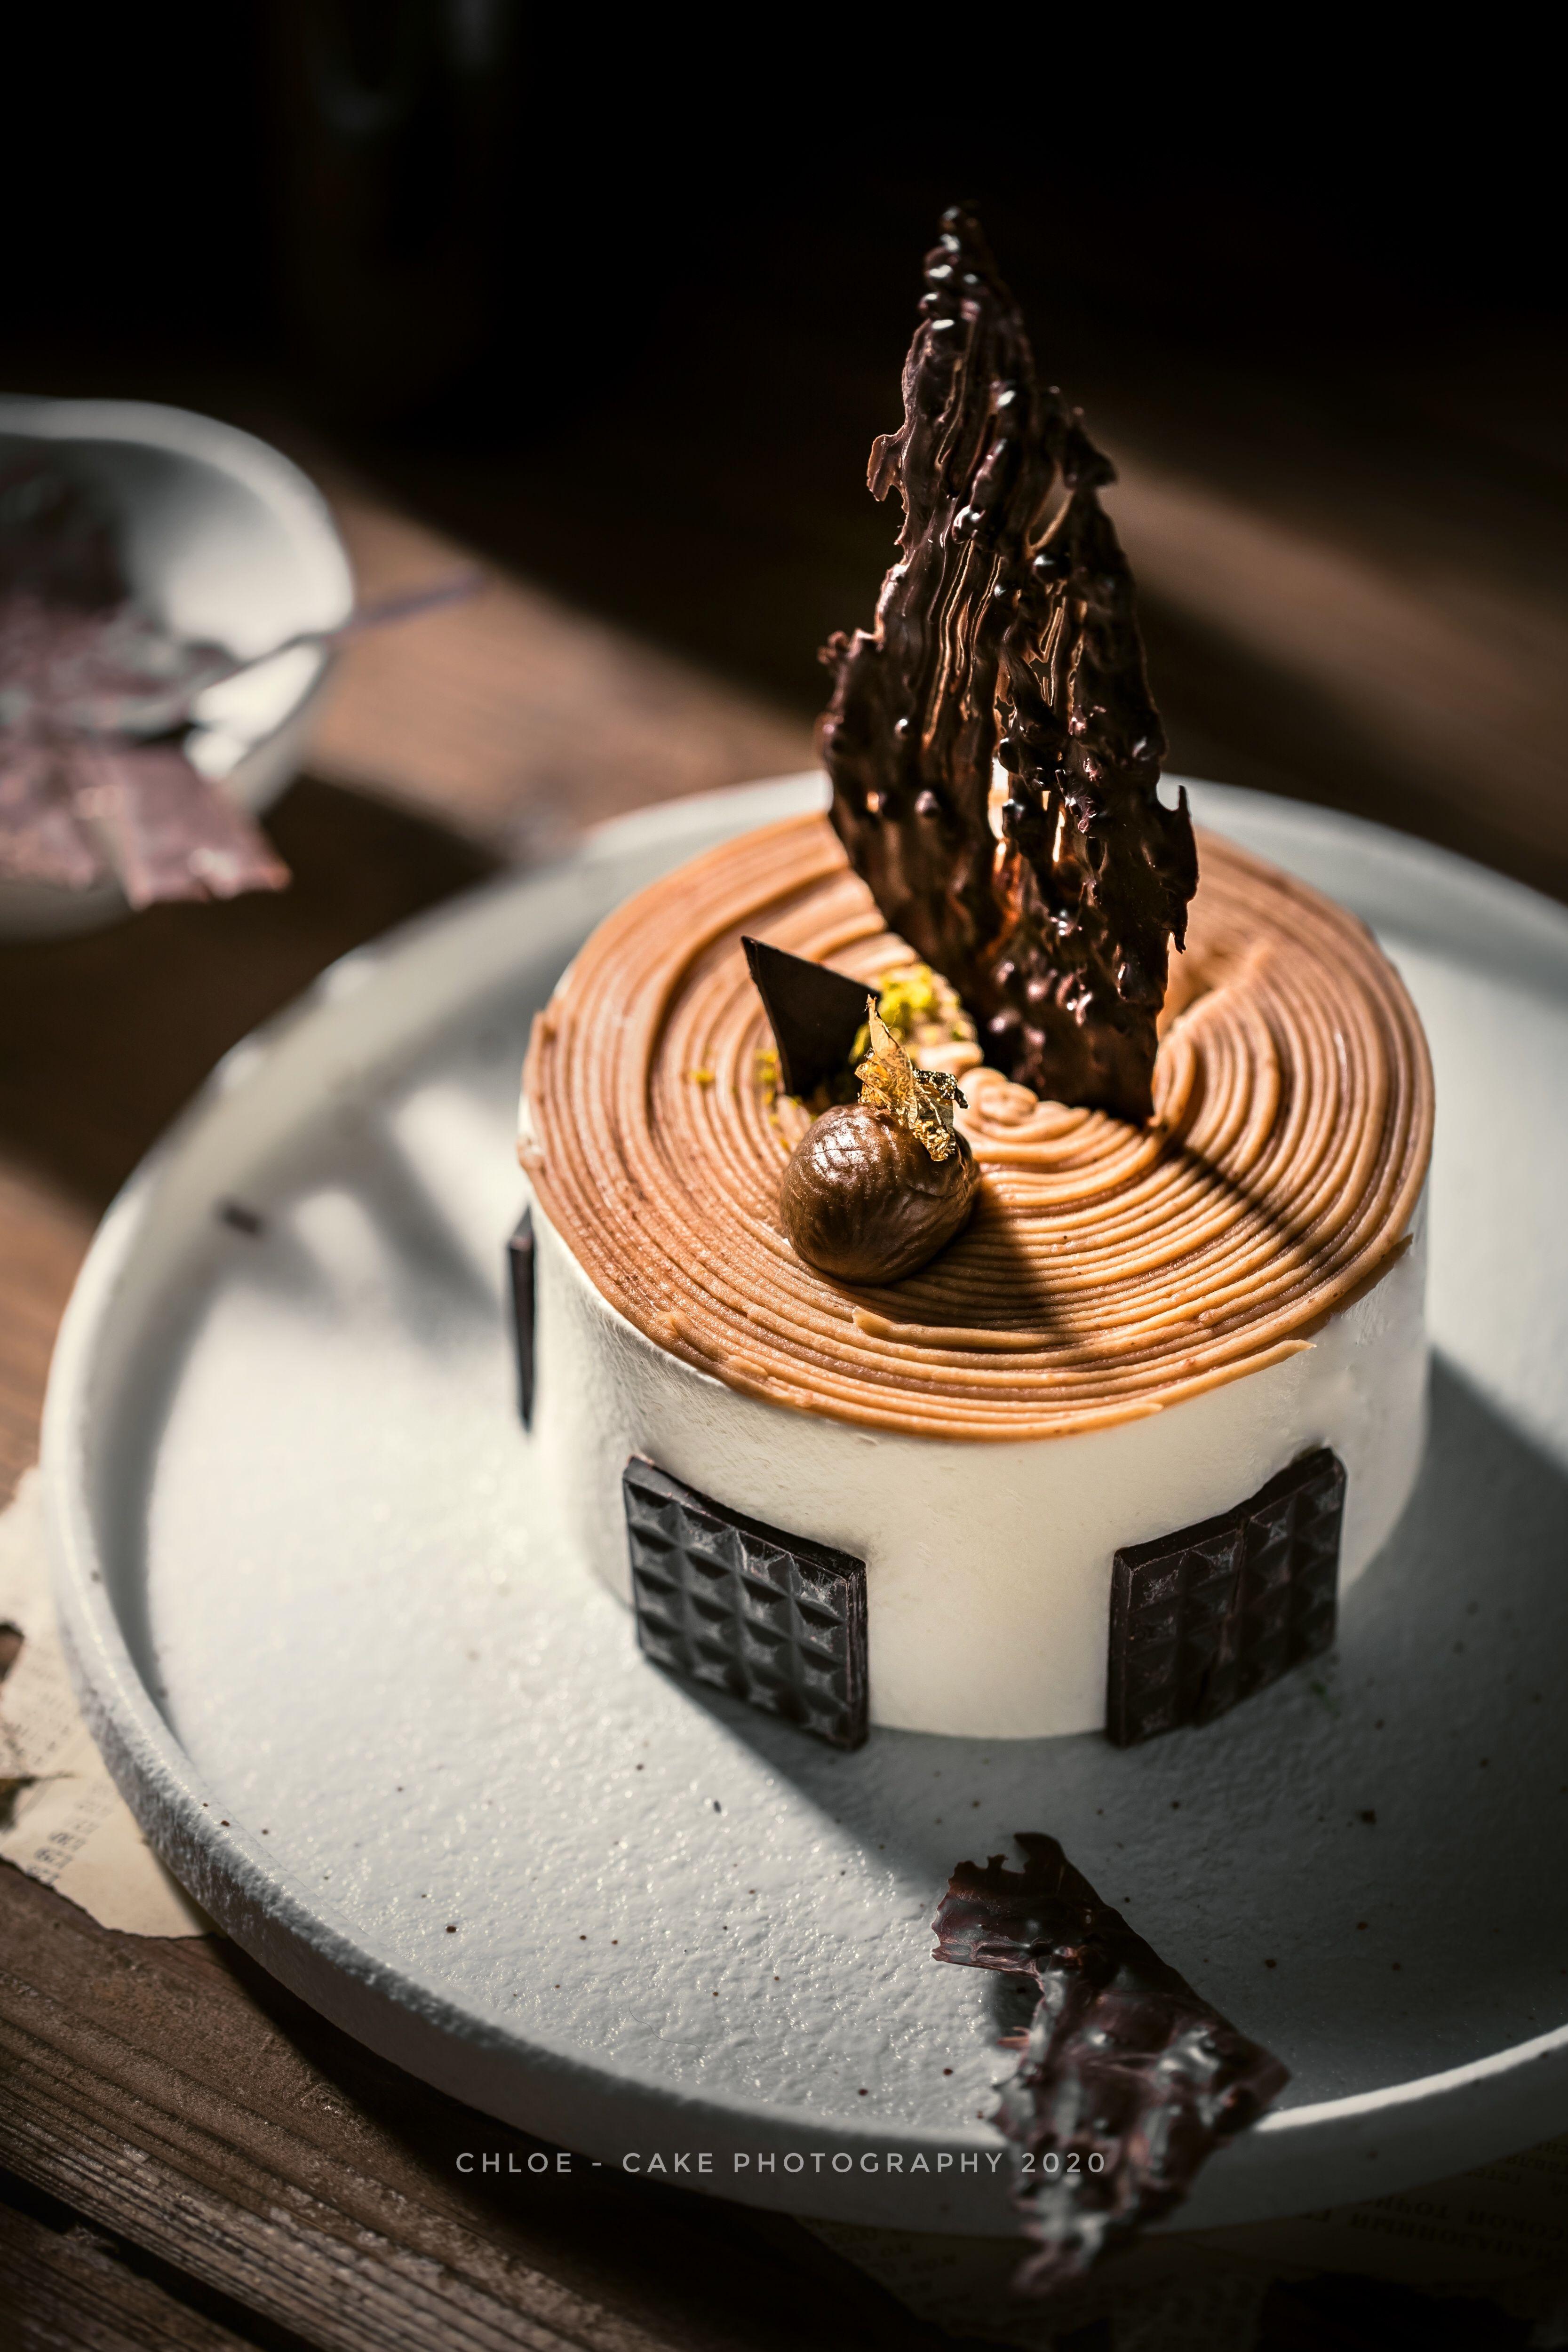 Chocolate Cake Photography Chloe